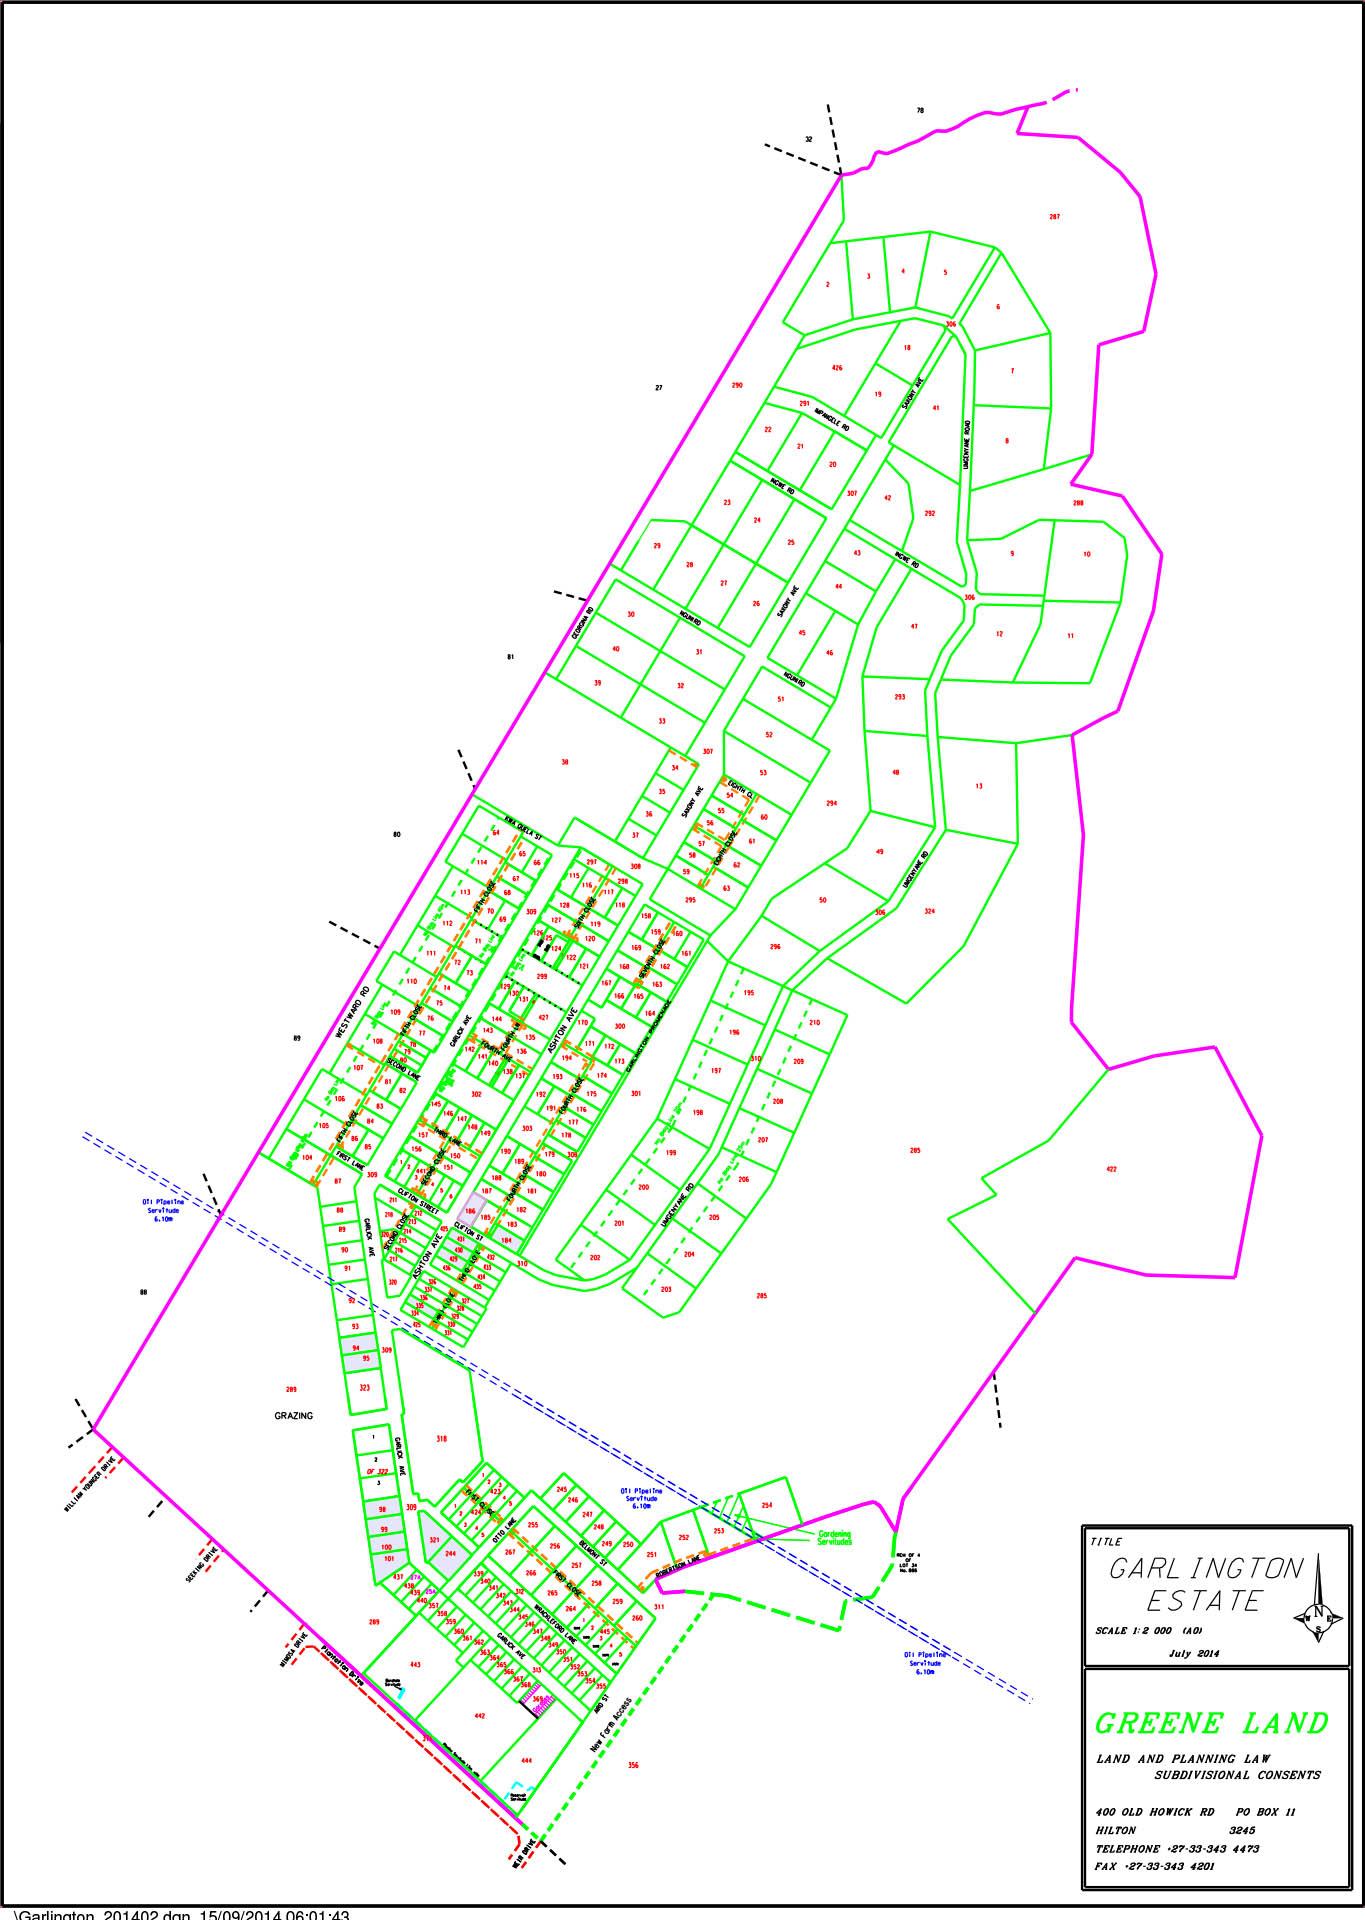 map-layout-garlington-estate-equipment-luxury-country-development-hilton-midlands-meander-kzn